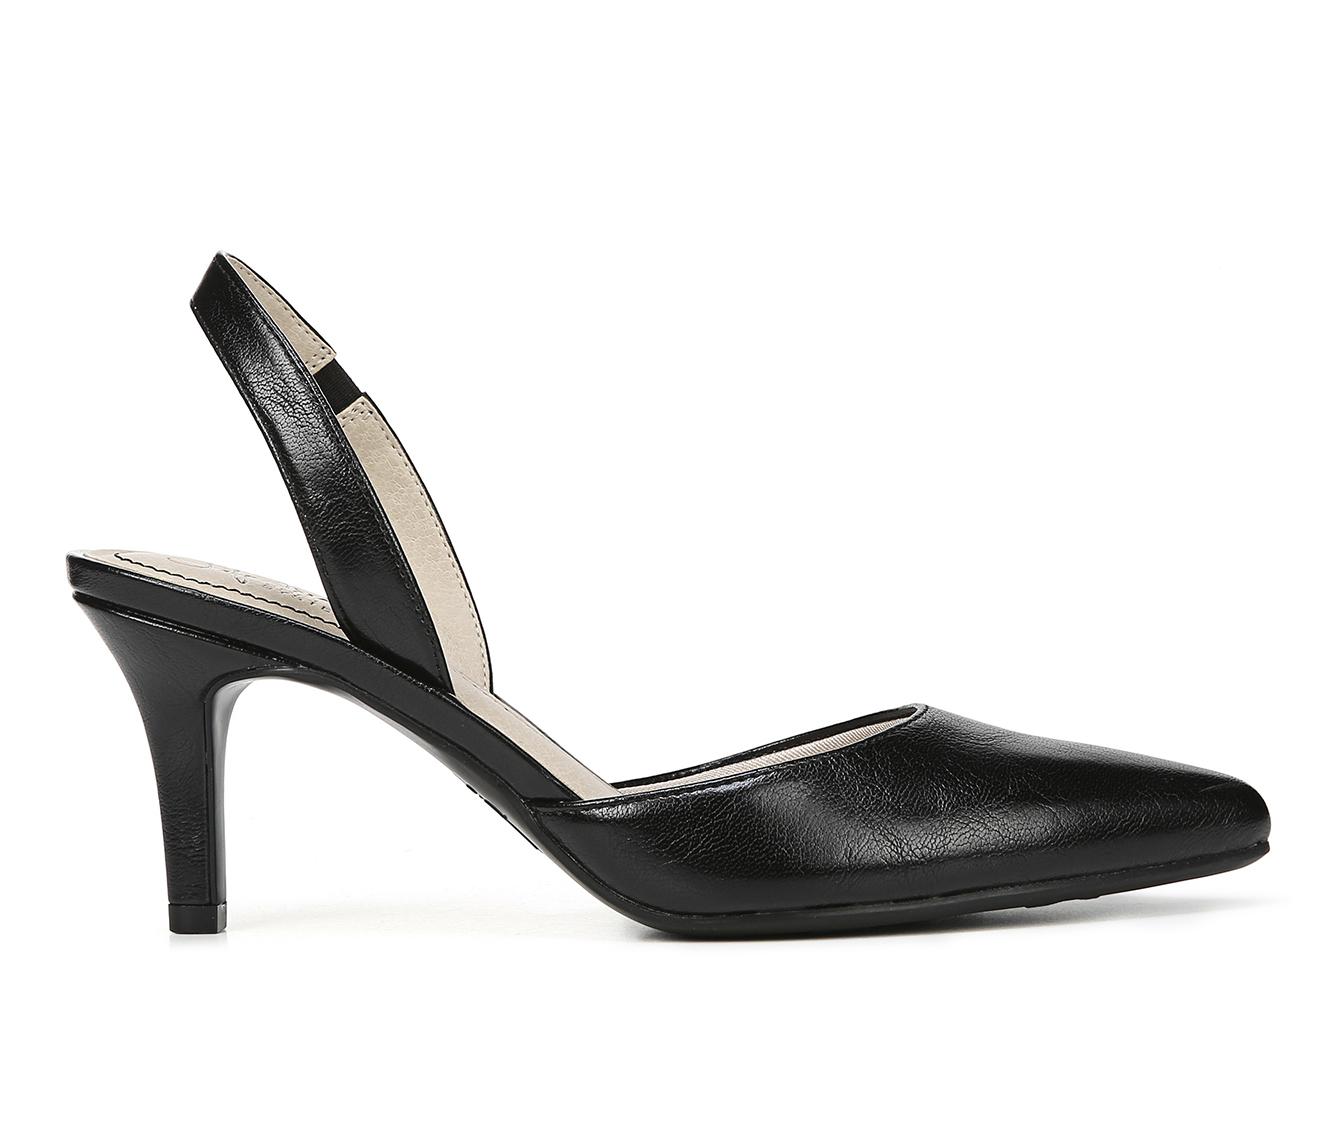 LifeStride Shane Women's Dress Shoe (Black Faux Leather)